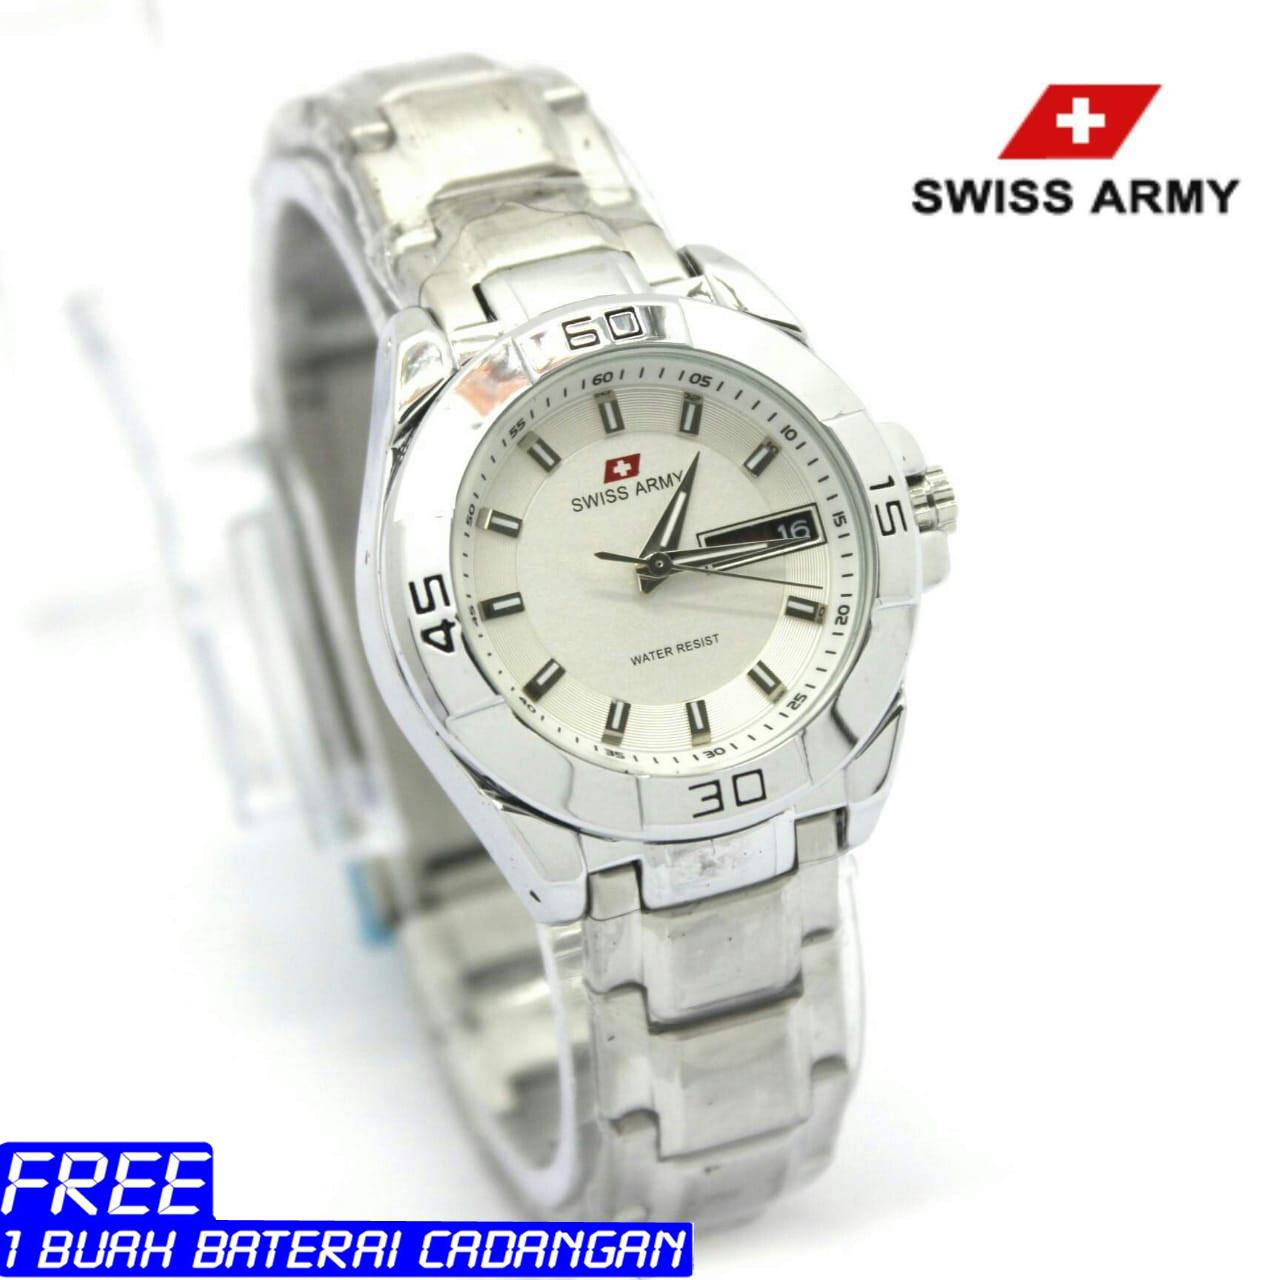 Swiss Army Sa 4372cj Chrono Hitam Abu Jam Tangan Fashion Pria Swis Bulan Ini Indonesia Price